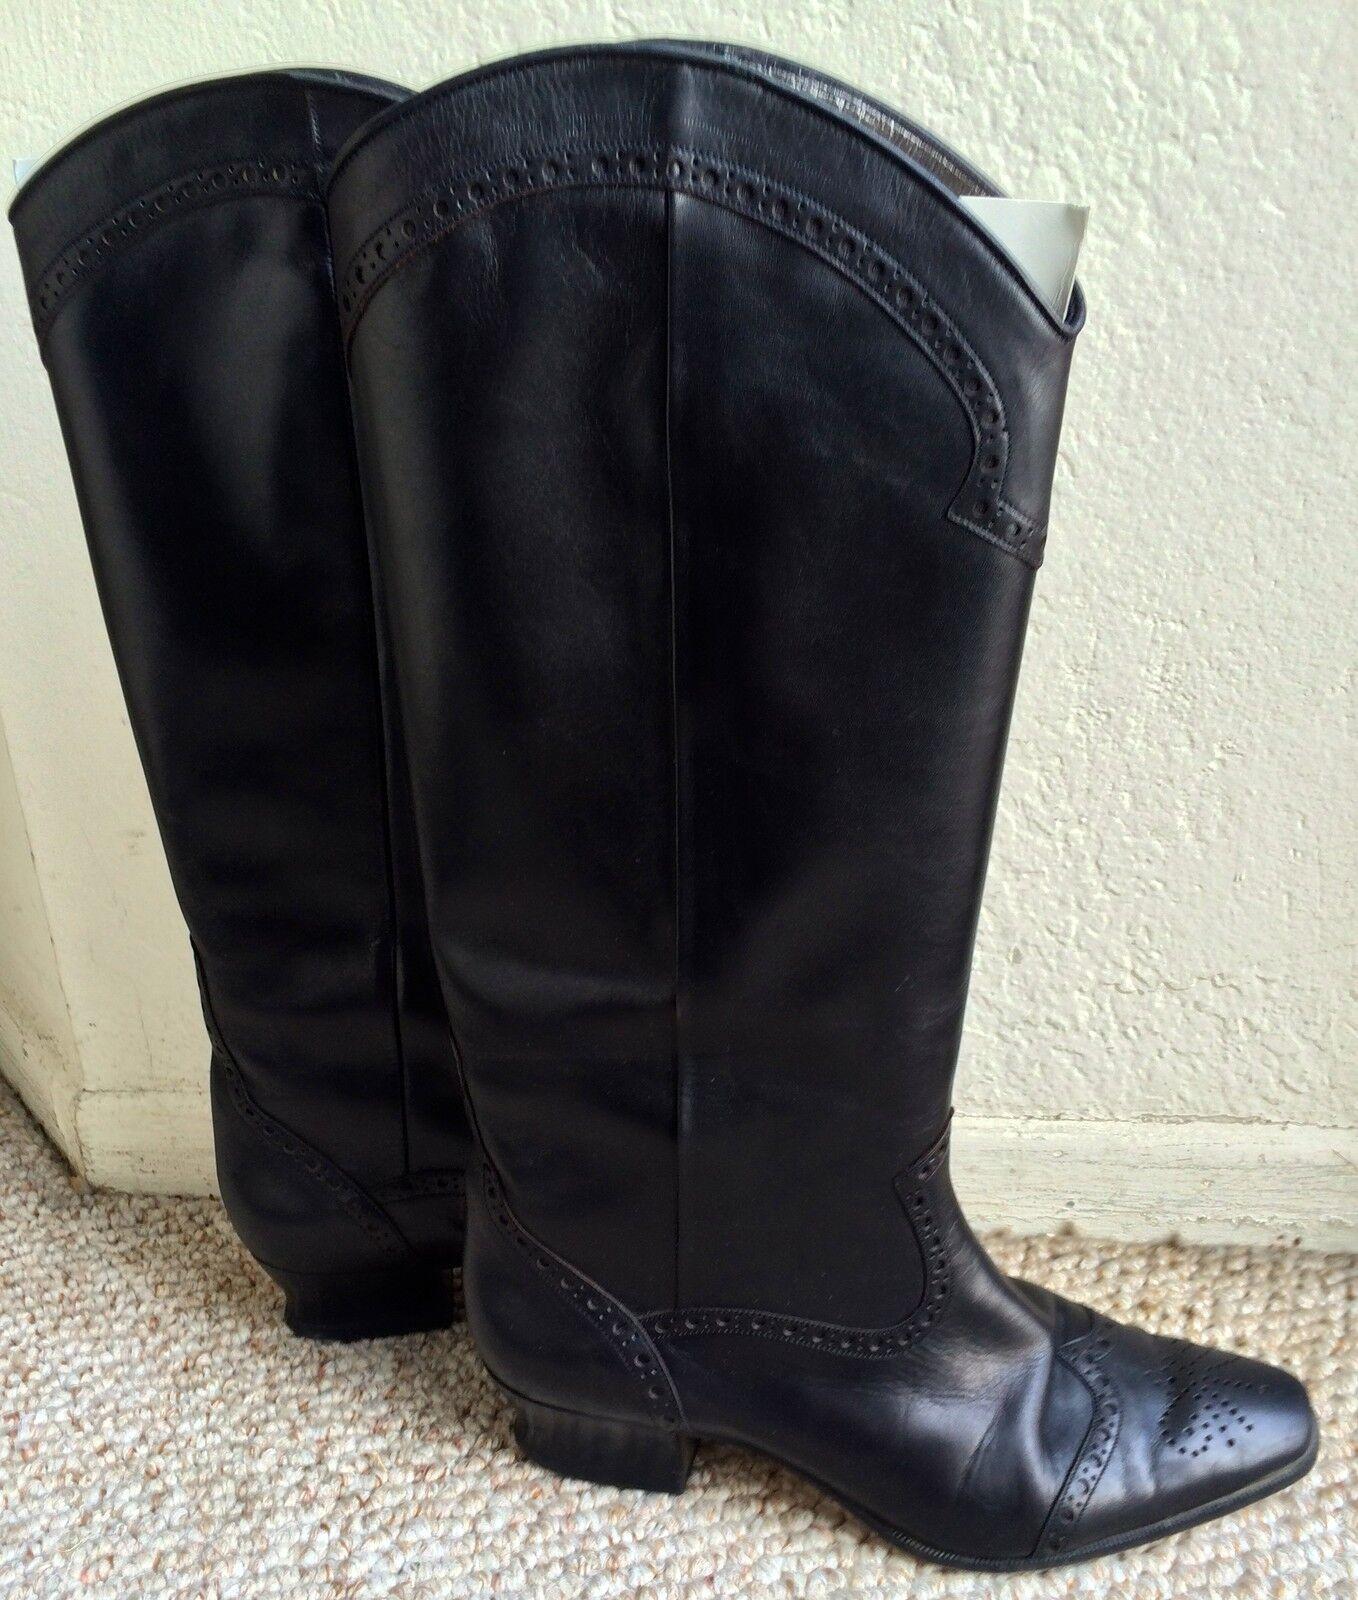 basso prezzo del 40% PETER FOX 8.5 WESTERN HEELS COWBOY COWBOY COWBOY COWGIRL nero LEATHER HIGH stivali scarpe W  BOX  ordinare on-line